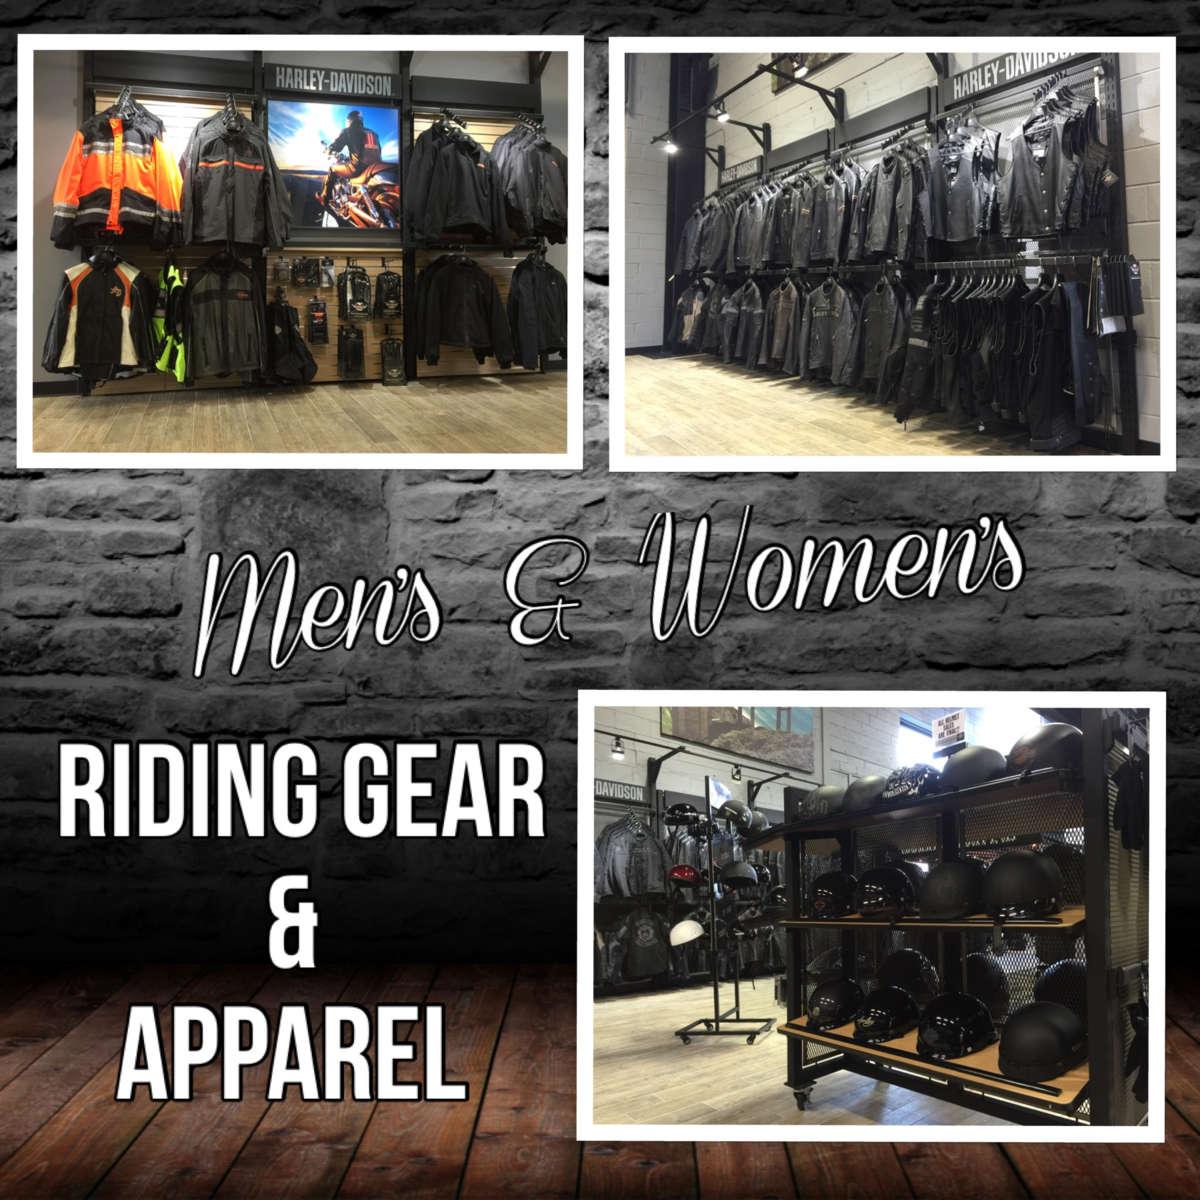 Motorclothes Department at Garden State Harley-Davidson